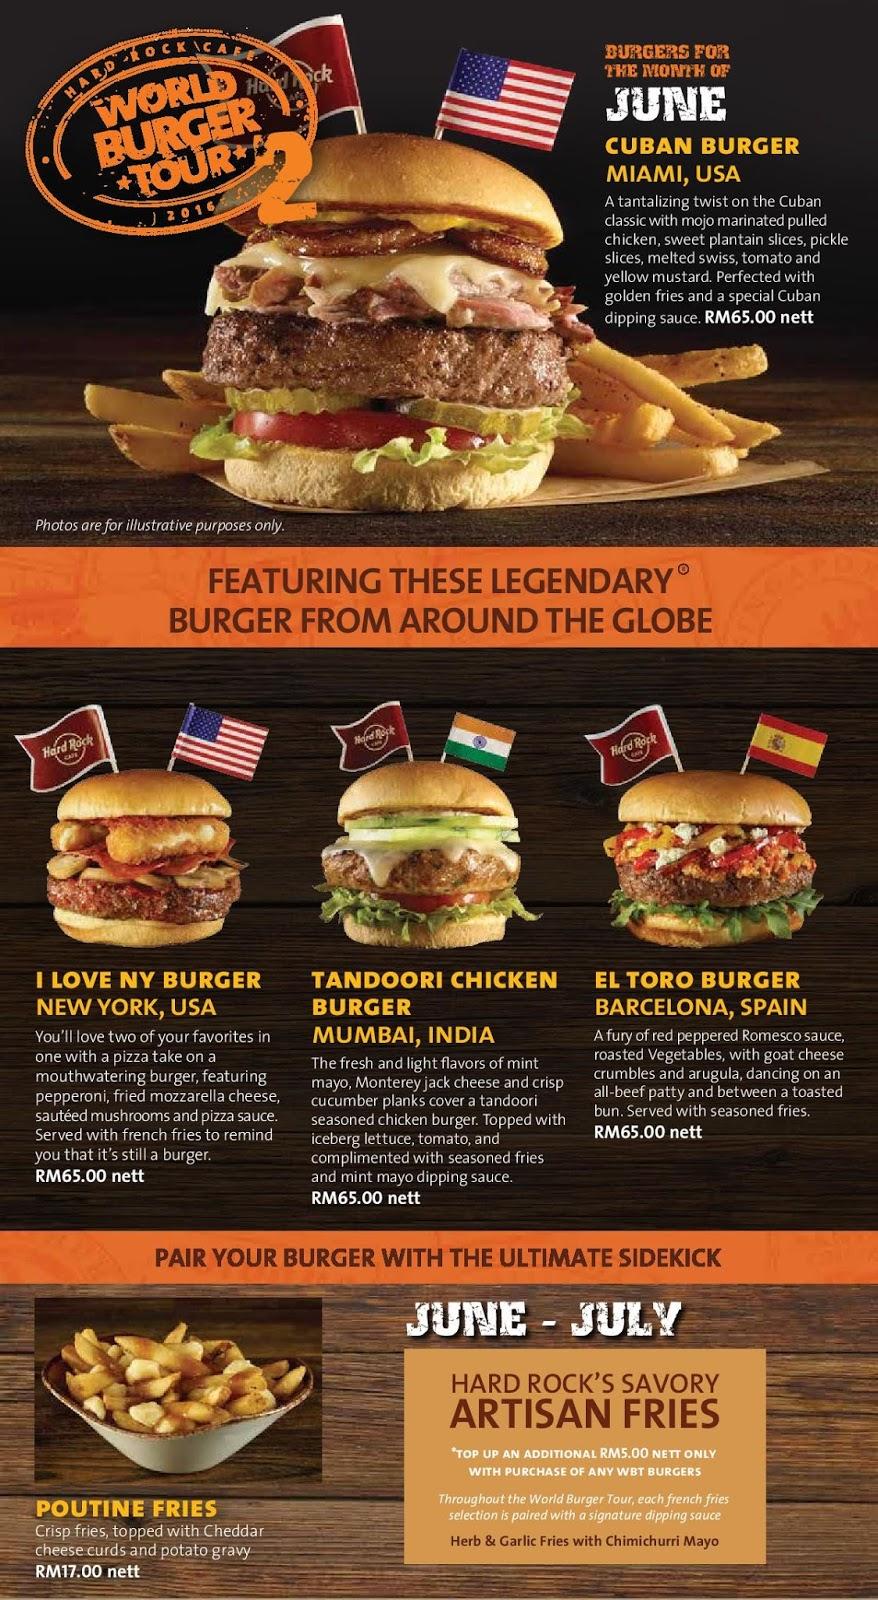 Bun Burger Commercial King Spank - Hot Nude-1433